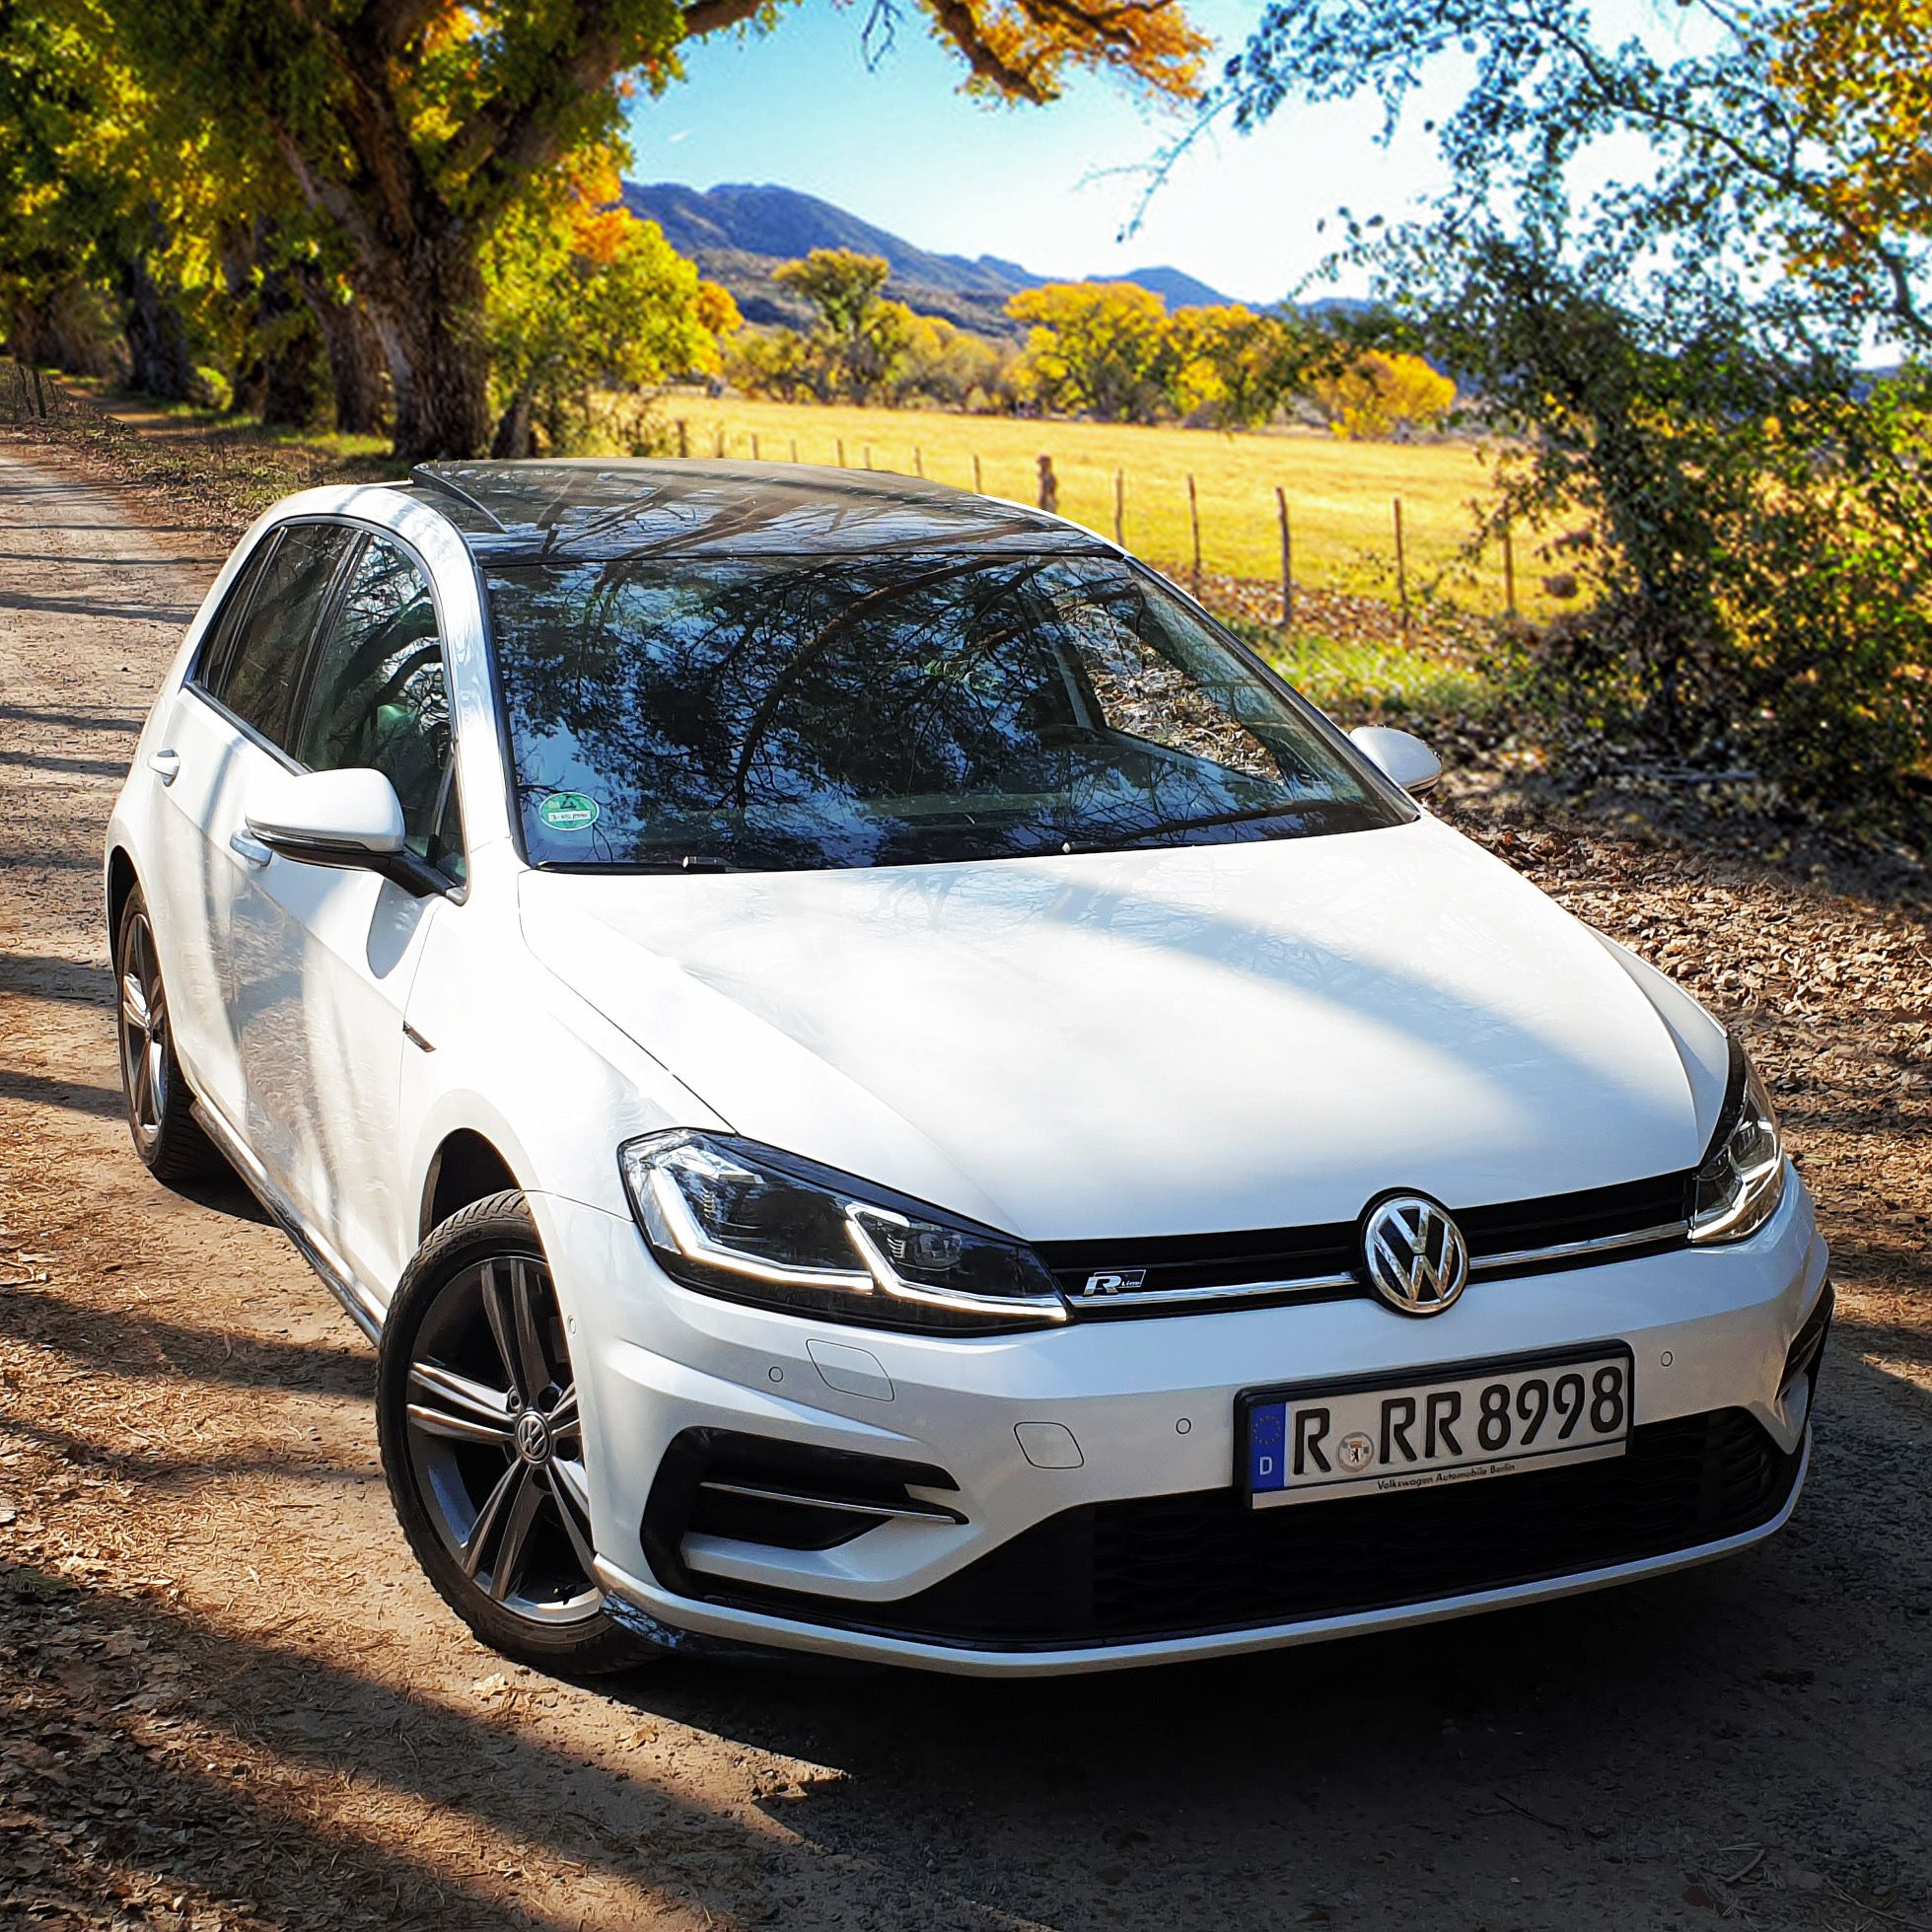 Golf 7 5 Rline In 2020 Car Volkswagen Vw Golf Black Audi